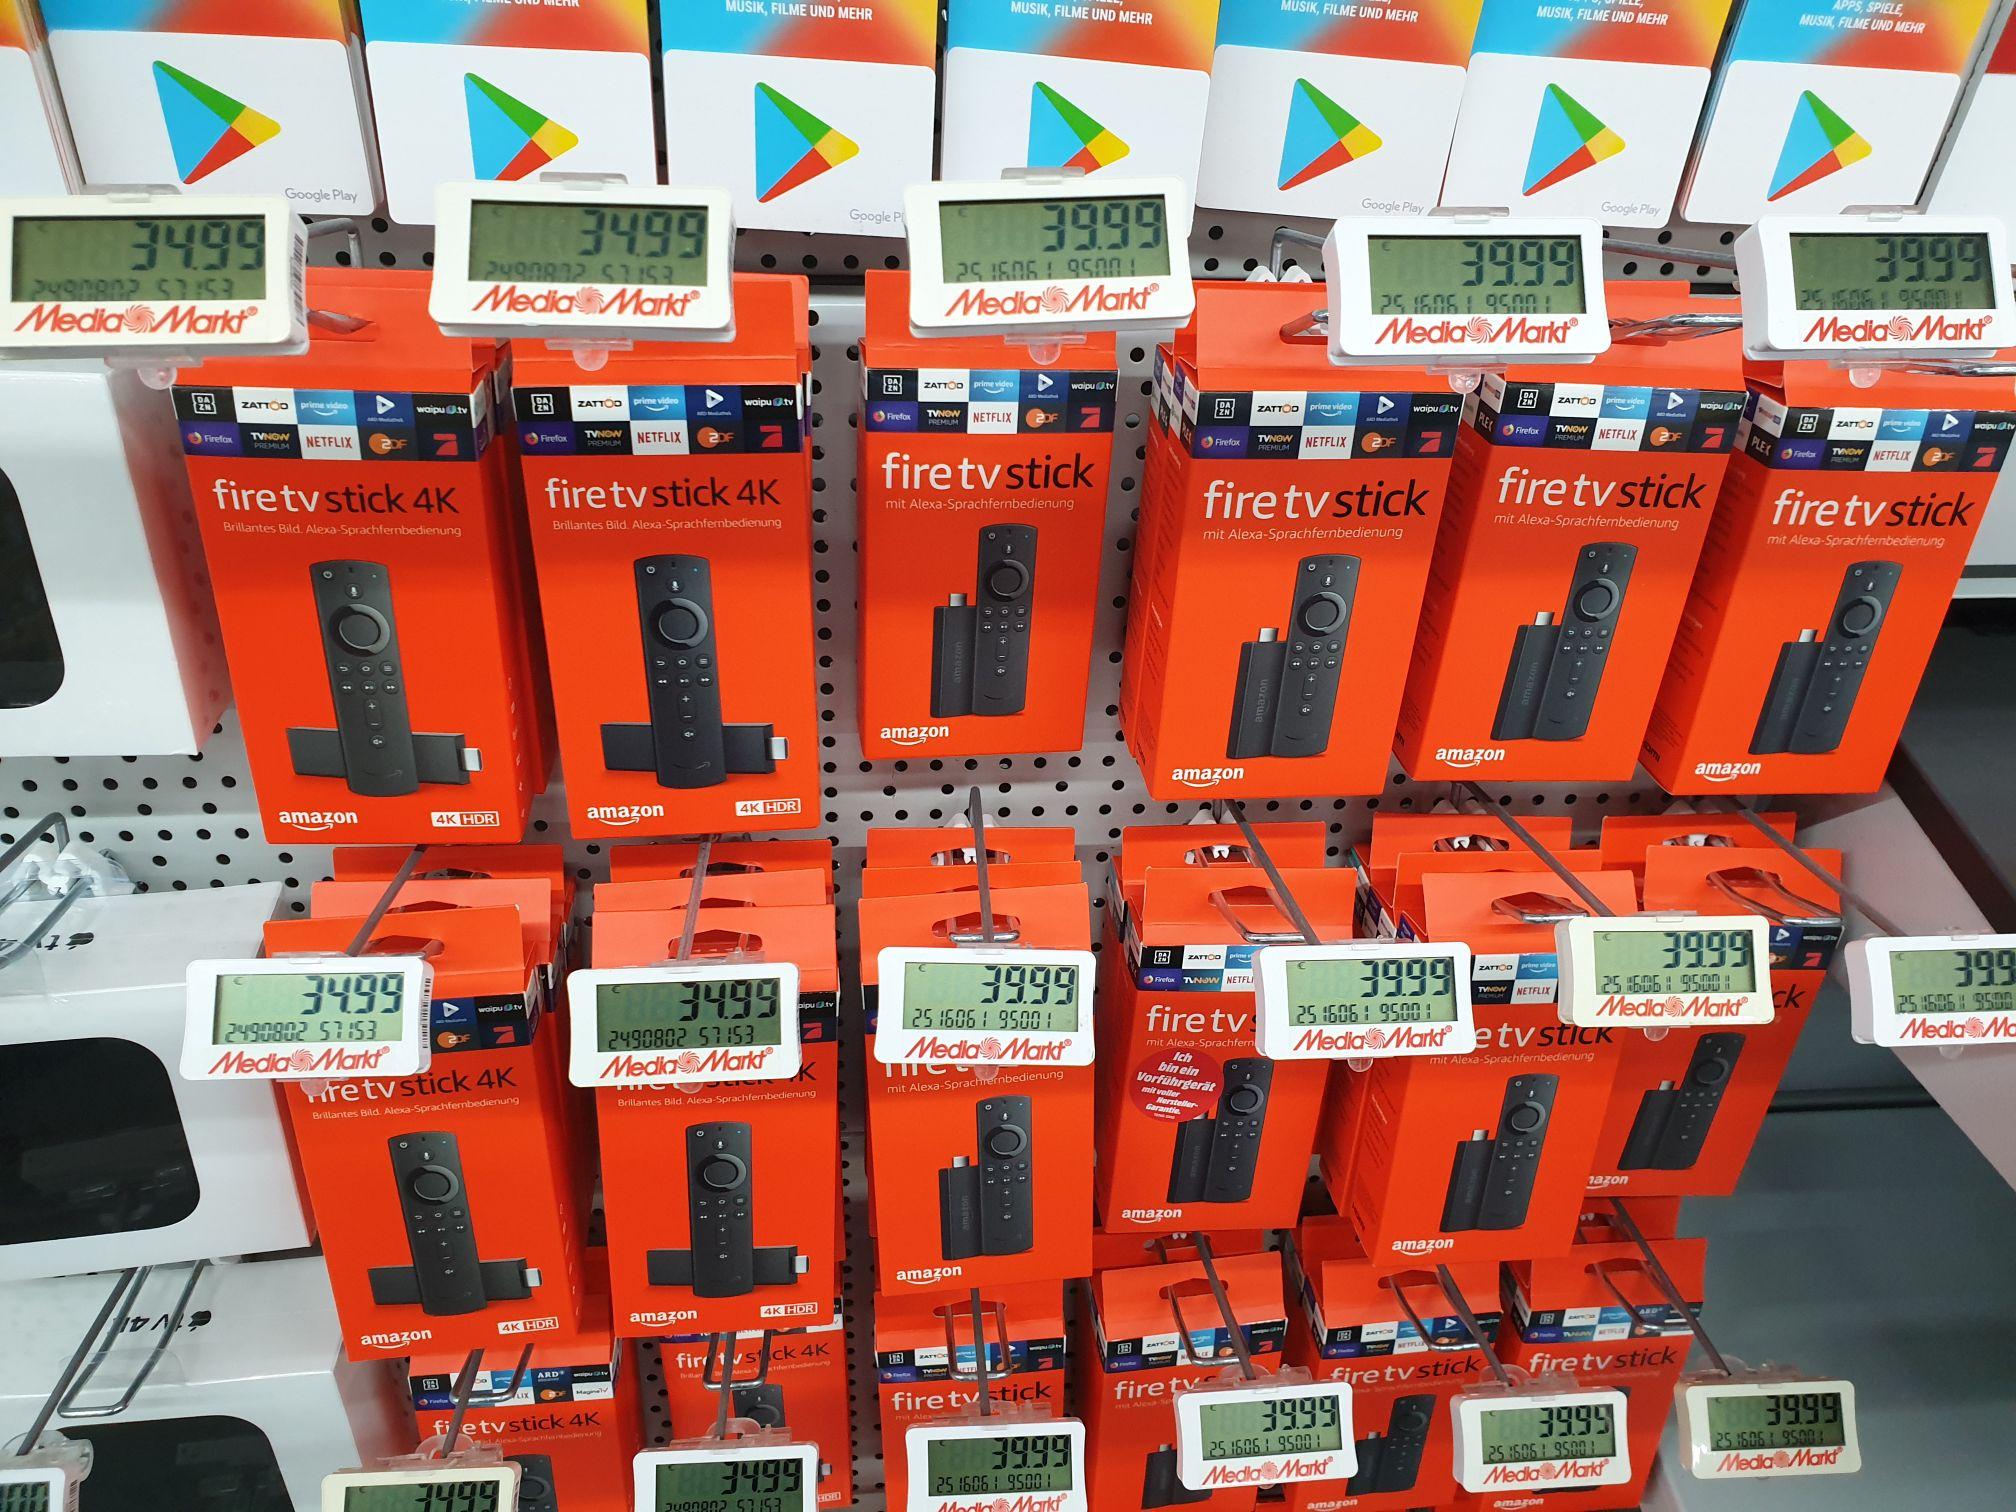 [LOKAL] Amazon FireTV Stick 4K 34,99€ MediaMarkt Straubing